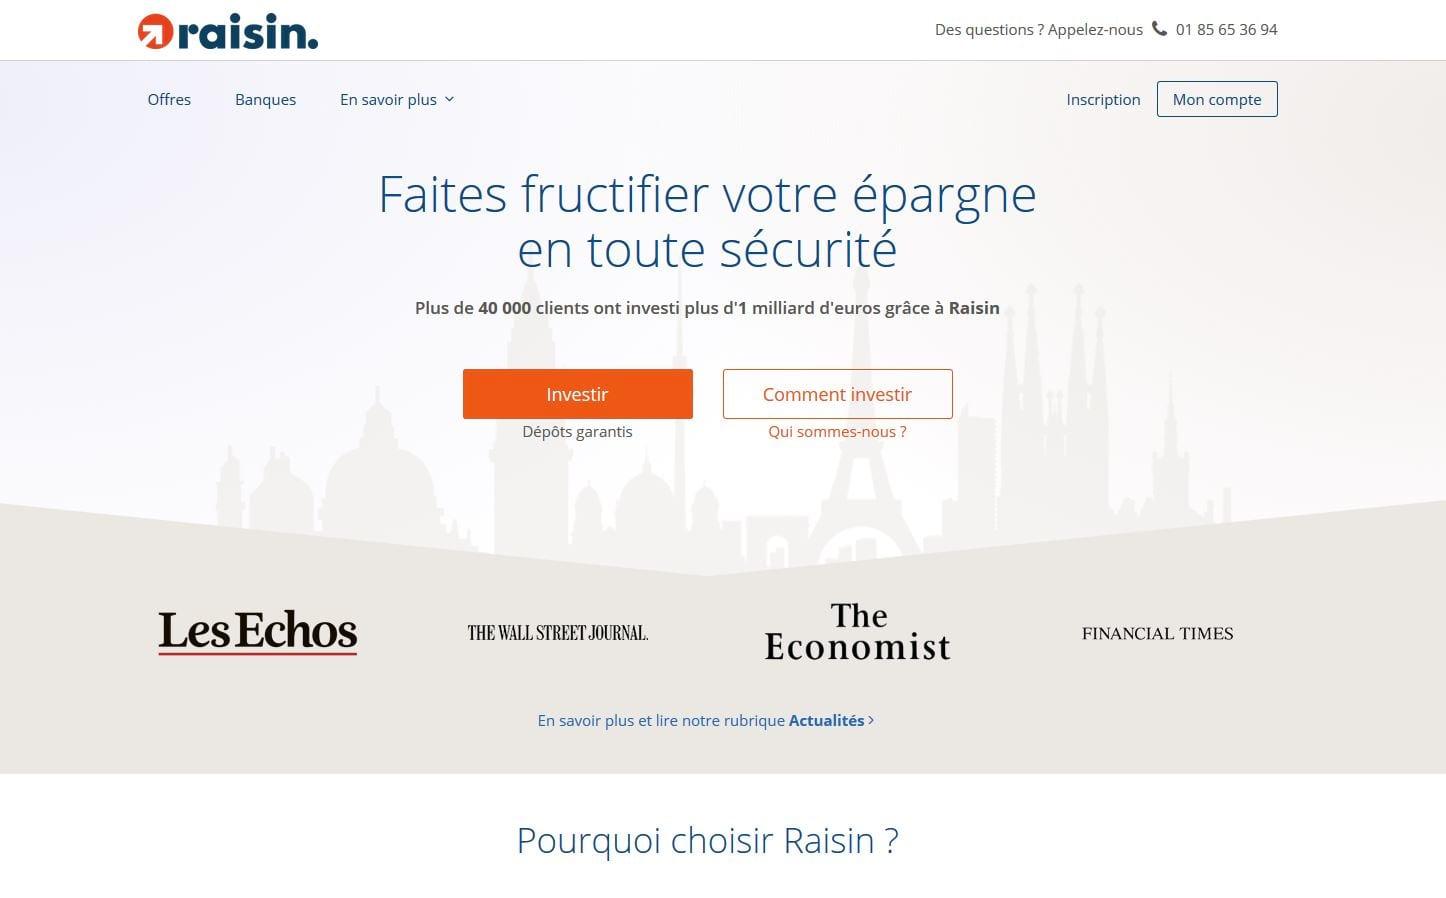 Raisin launches platform for France